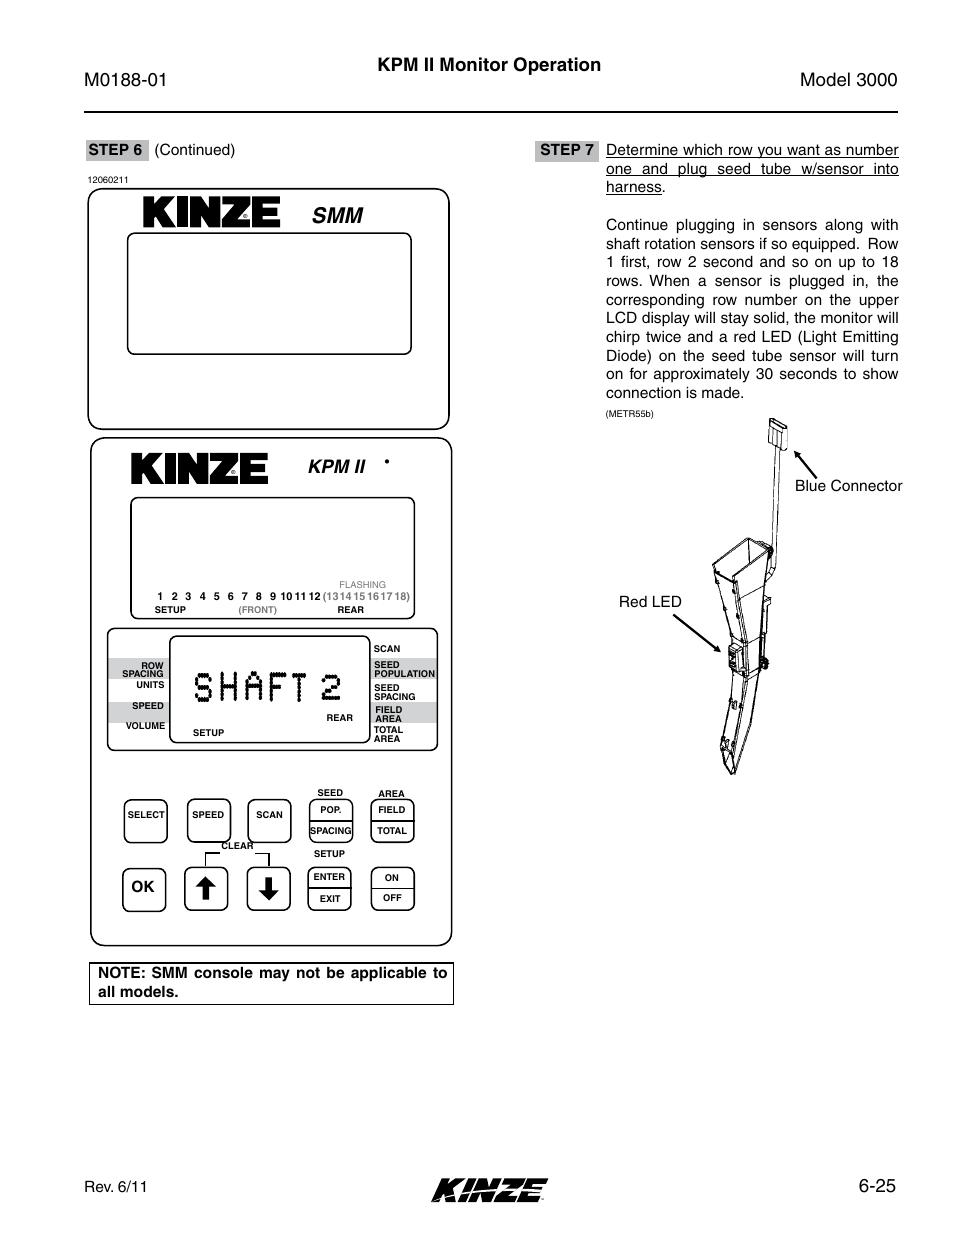 25 kpm ii monitor operation kpm ii rev 6 11 kinze 3000 rigid rh manualsdir com Kinze 3600 Kinze 3000 Planter